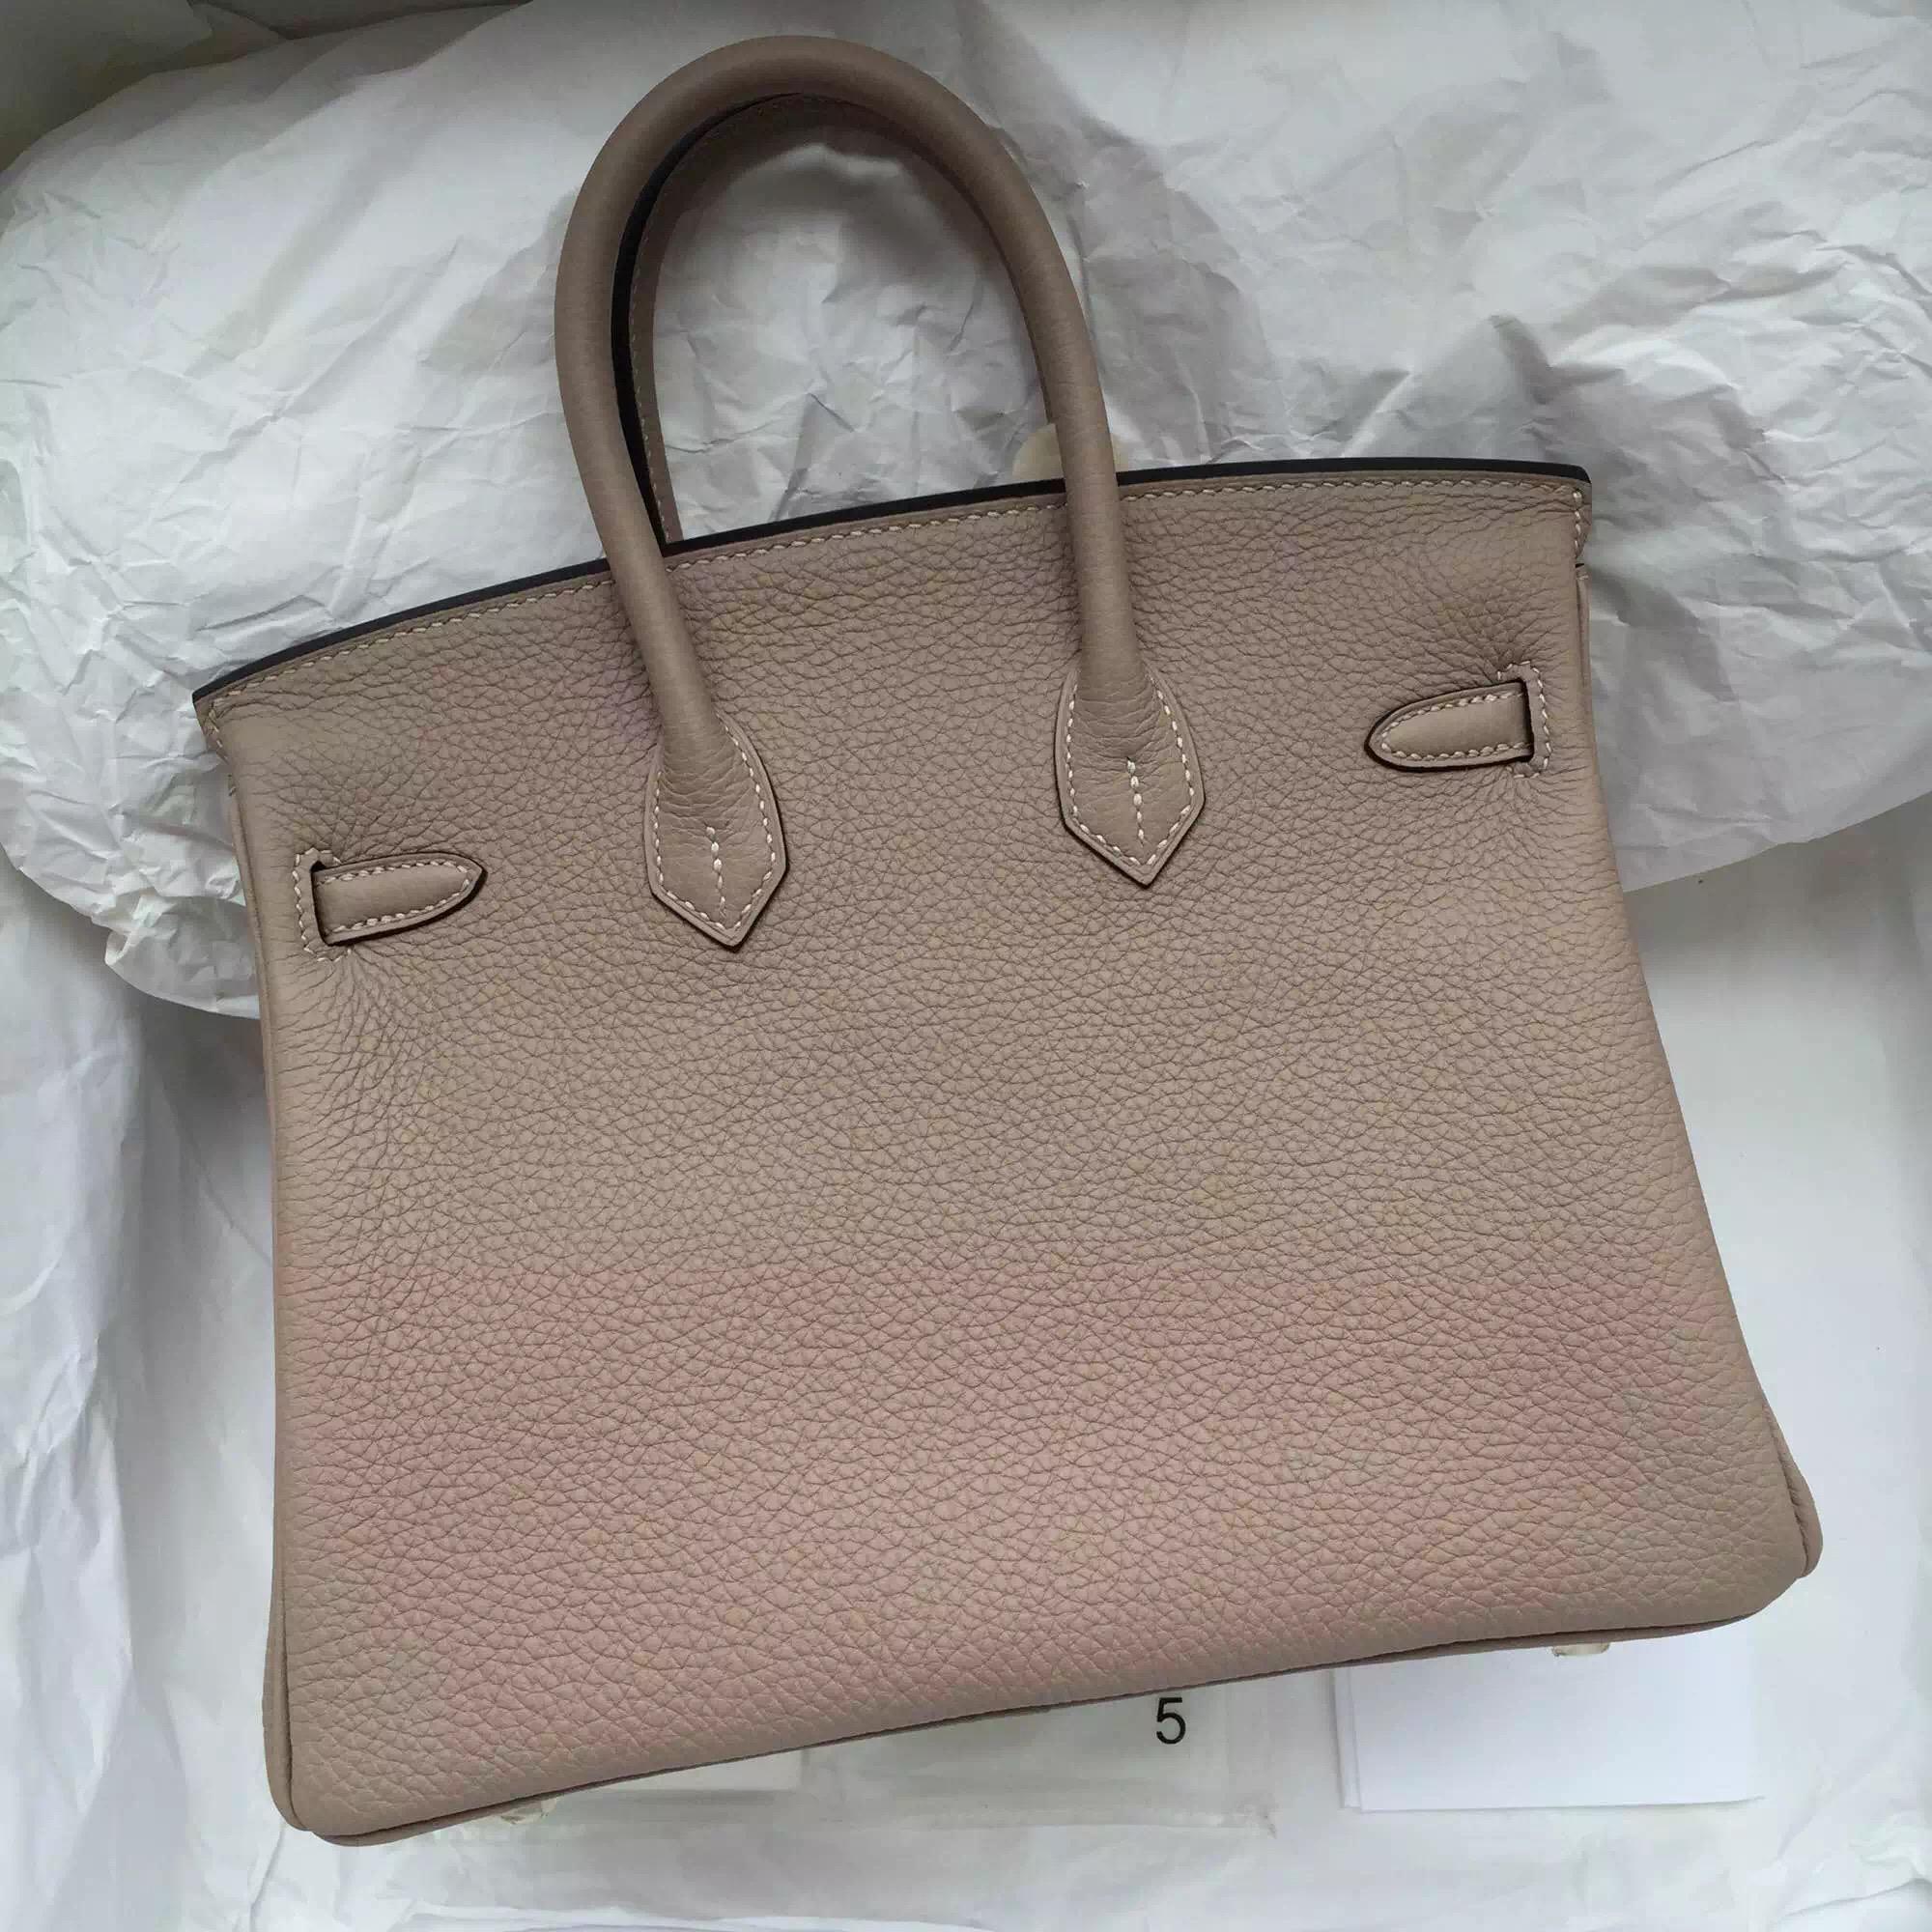 Gris Tourterelle/2R Pink Peony inner Togo Leather Hermes Birkin 25CM Silver Hardware